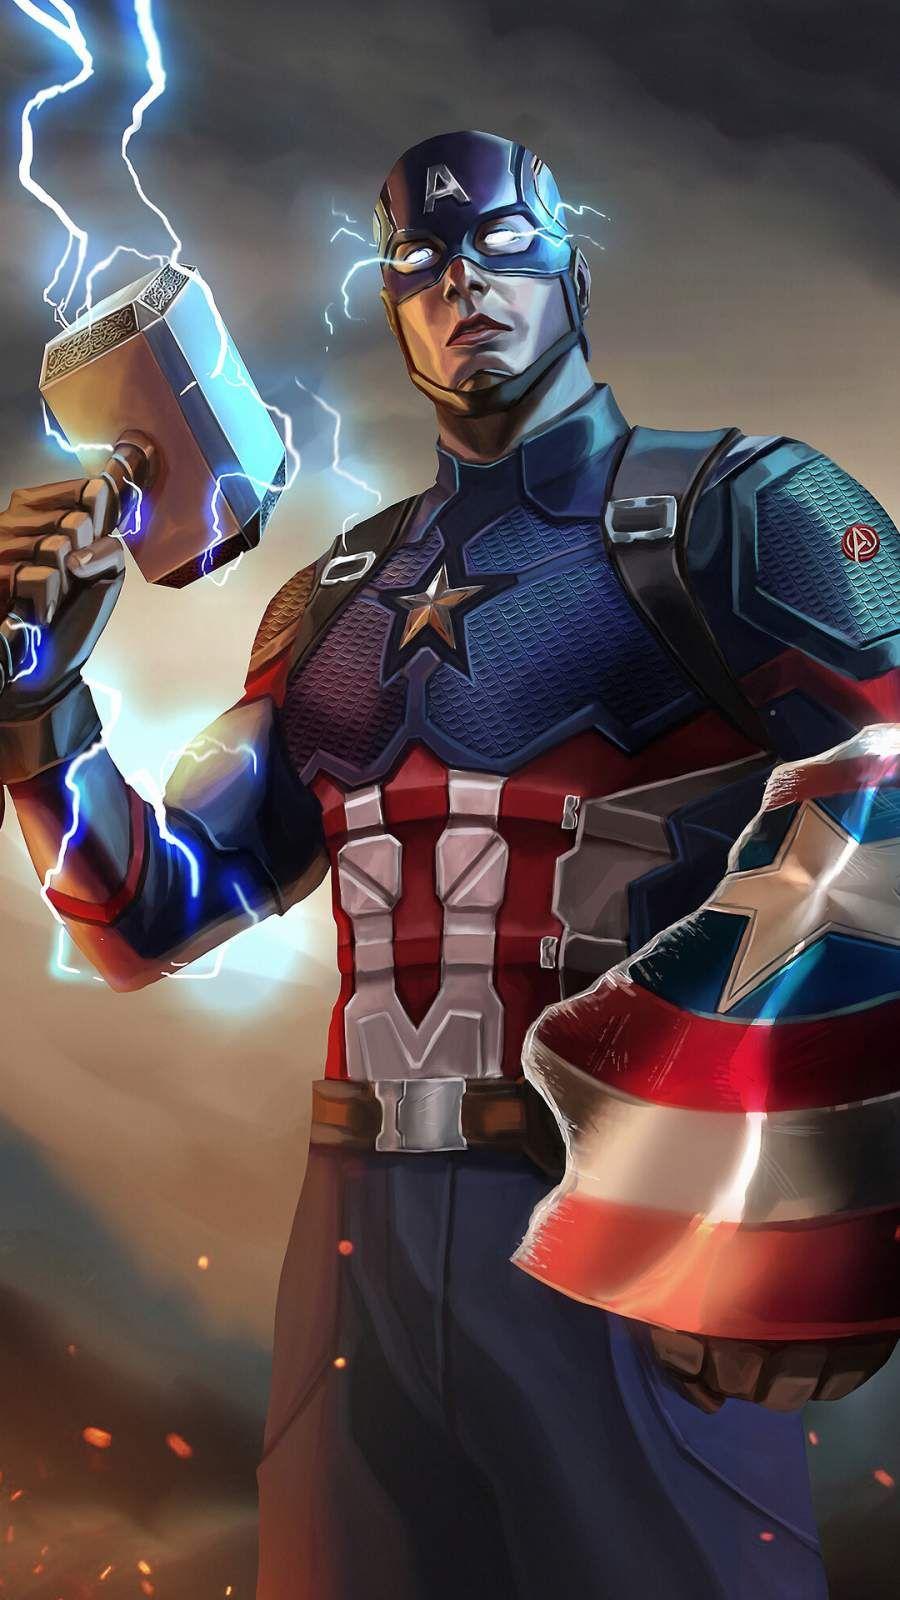 Captain America Mjolnir Artwork Iphone Wallpaper Captain America Art Captain America Wallpaper Captain America Comic